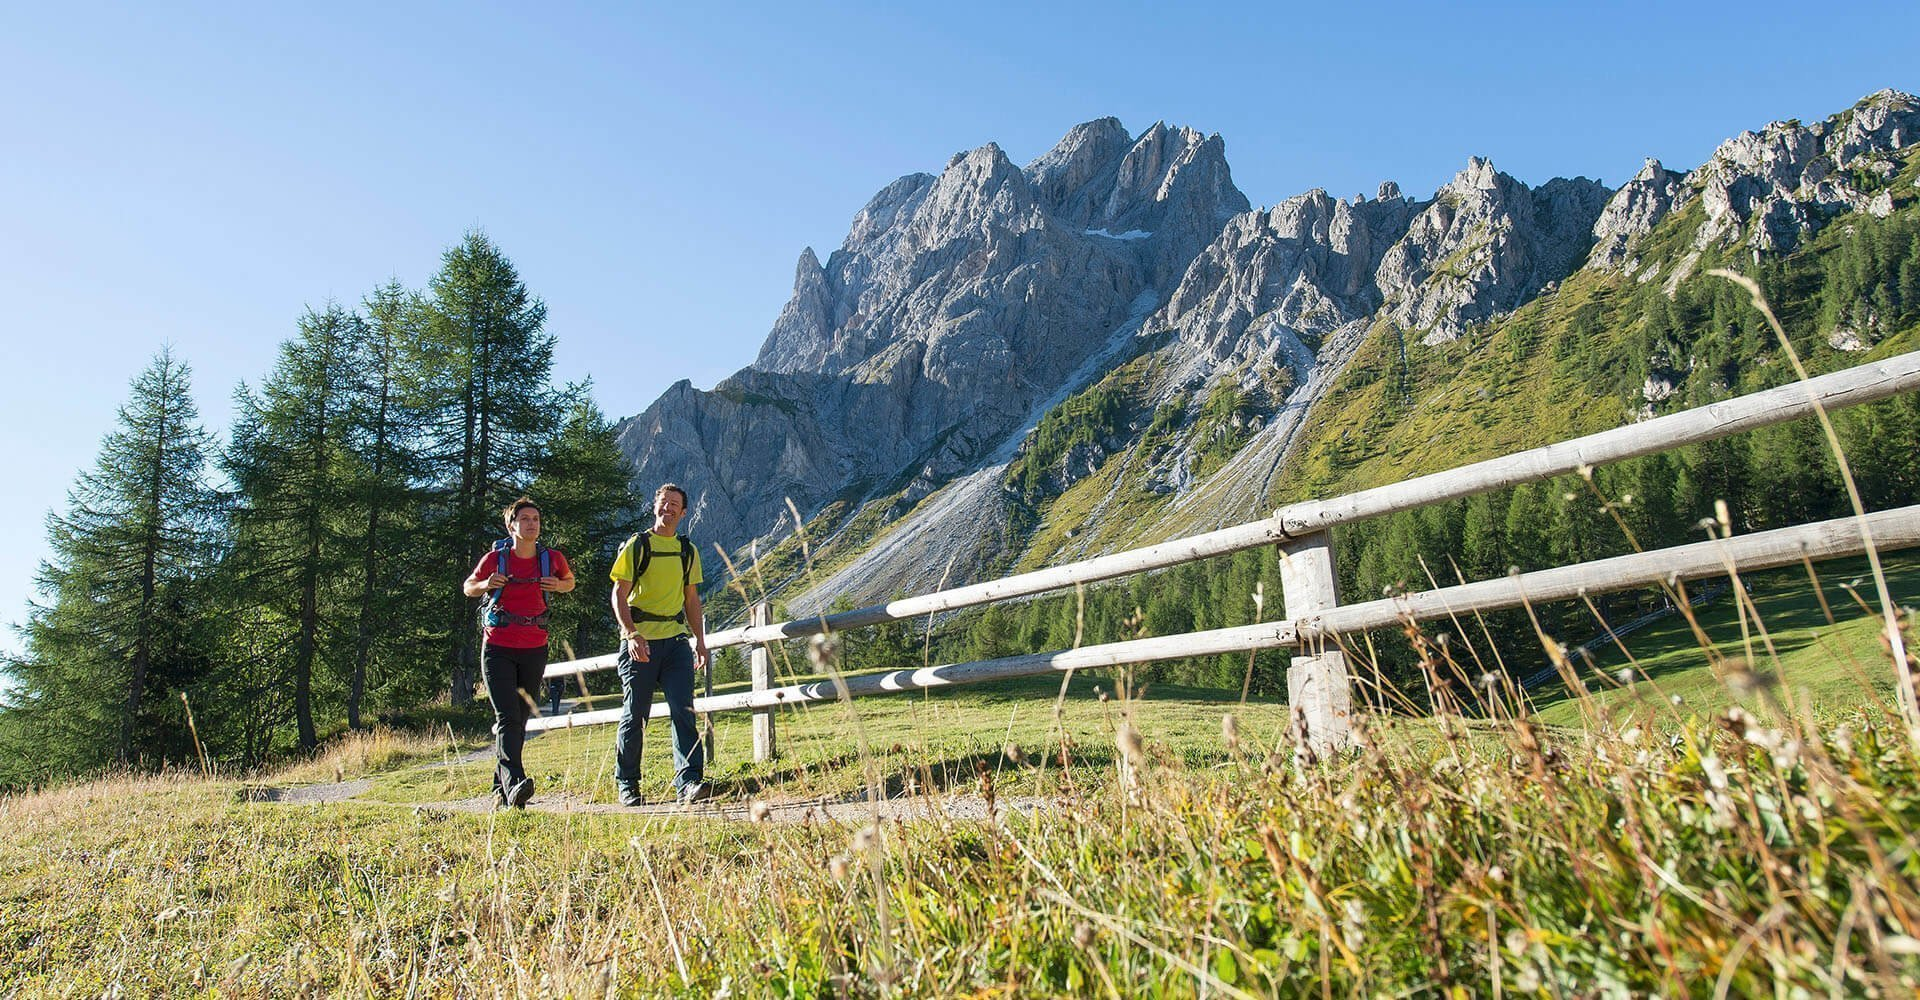 Hotel Kristall | Wanderurlaub in Meransen | Nordic Walking & Mountainbike